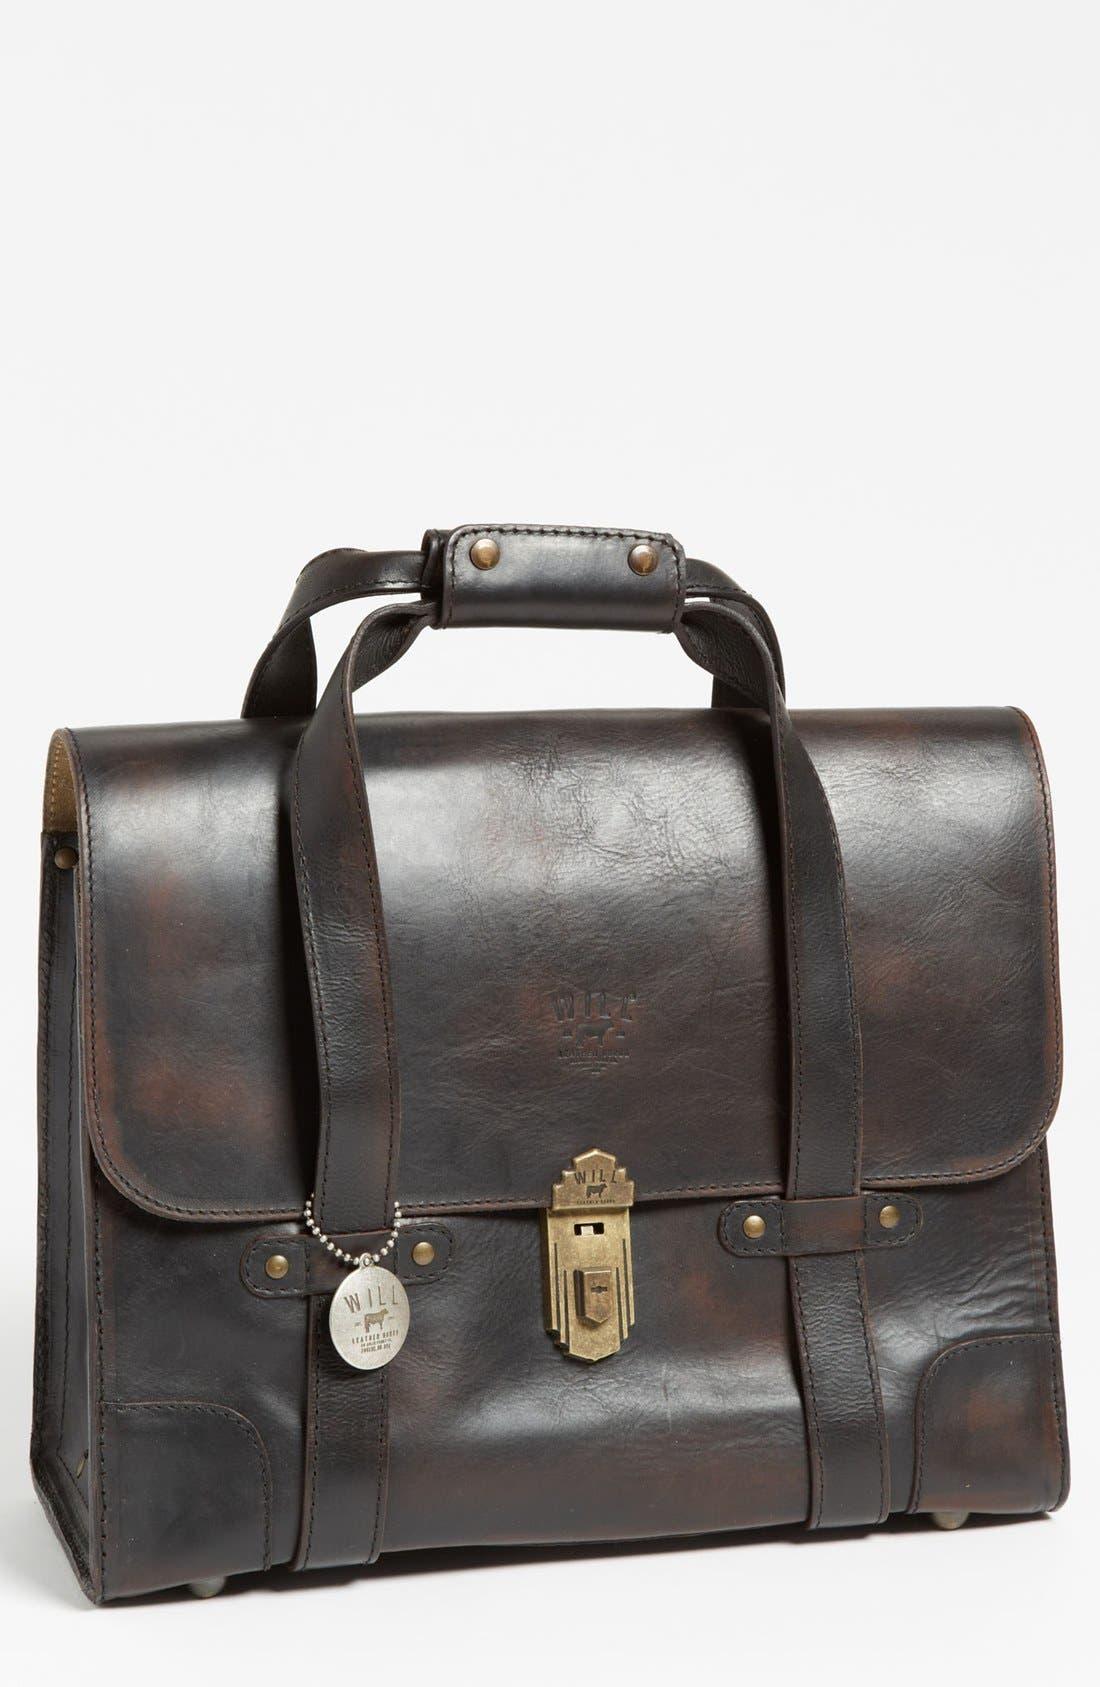 Main Image - Will Leather Goods 'Everett' Satchel